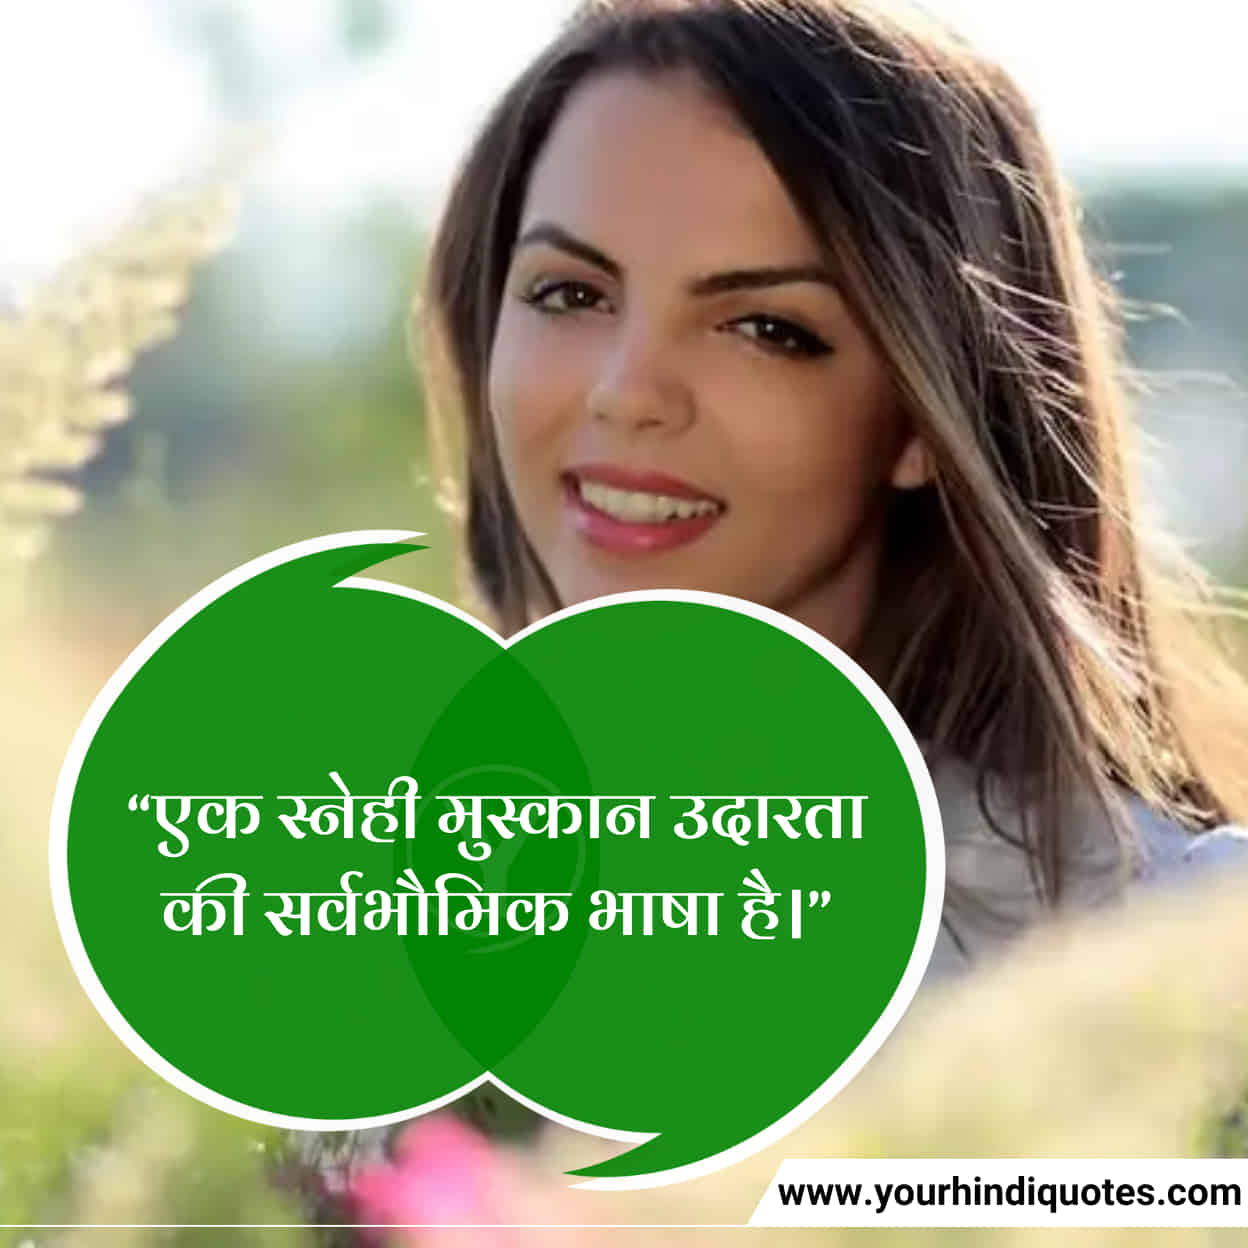 Cute Hindi Smile Quotes